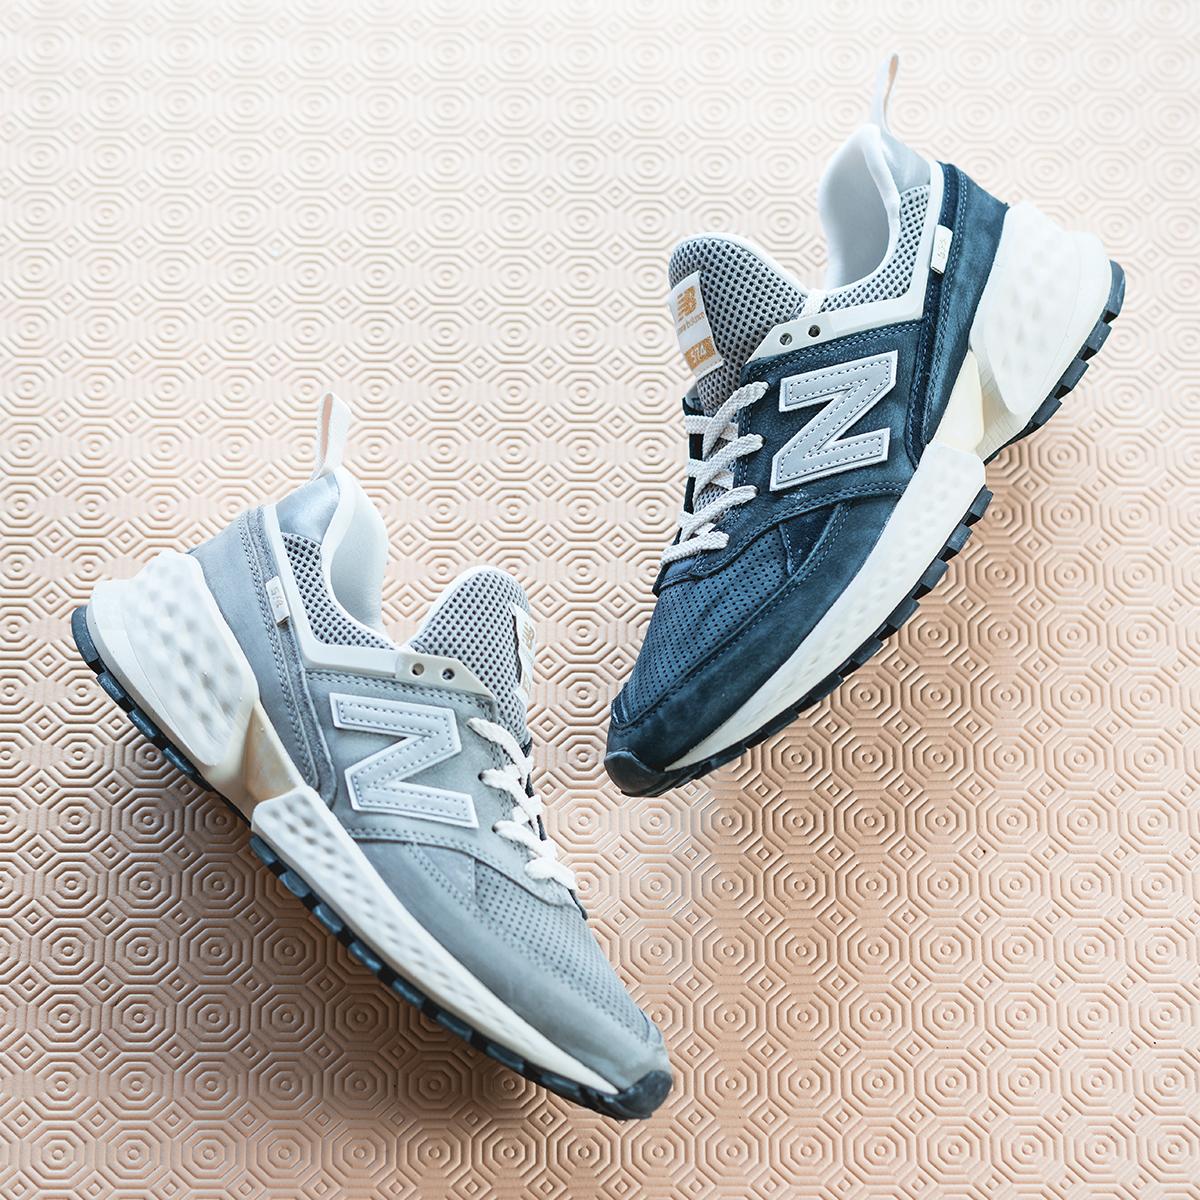 20% off footwear